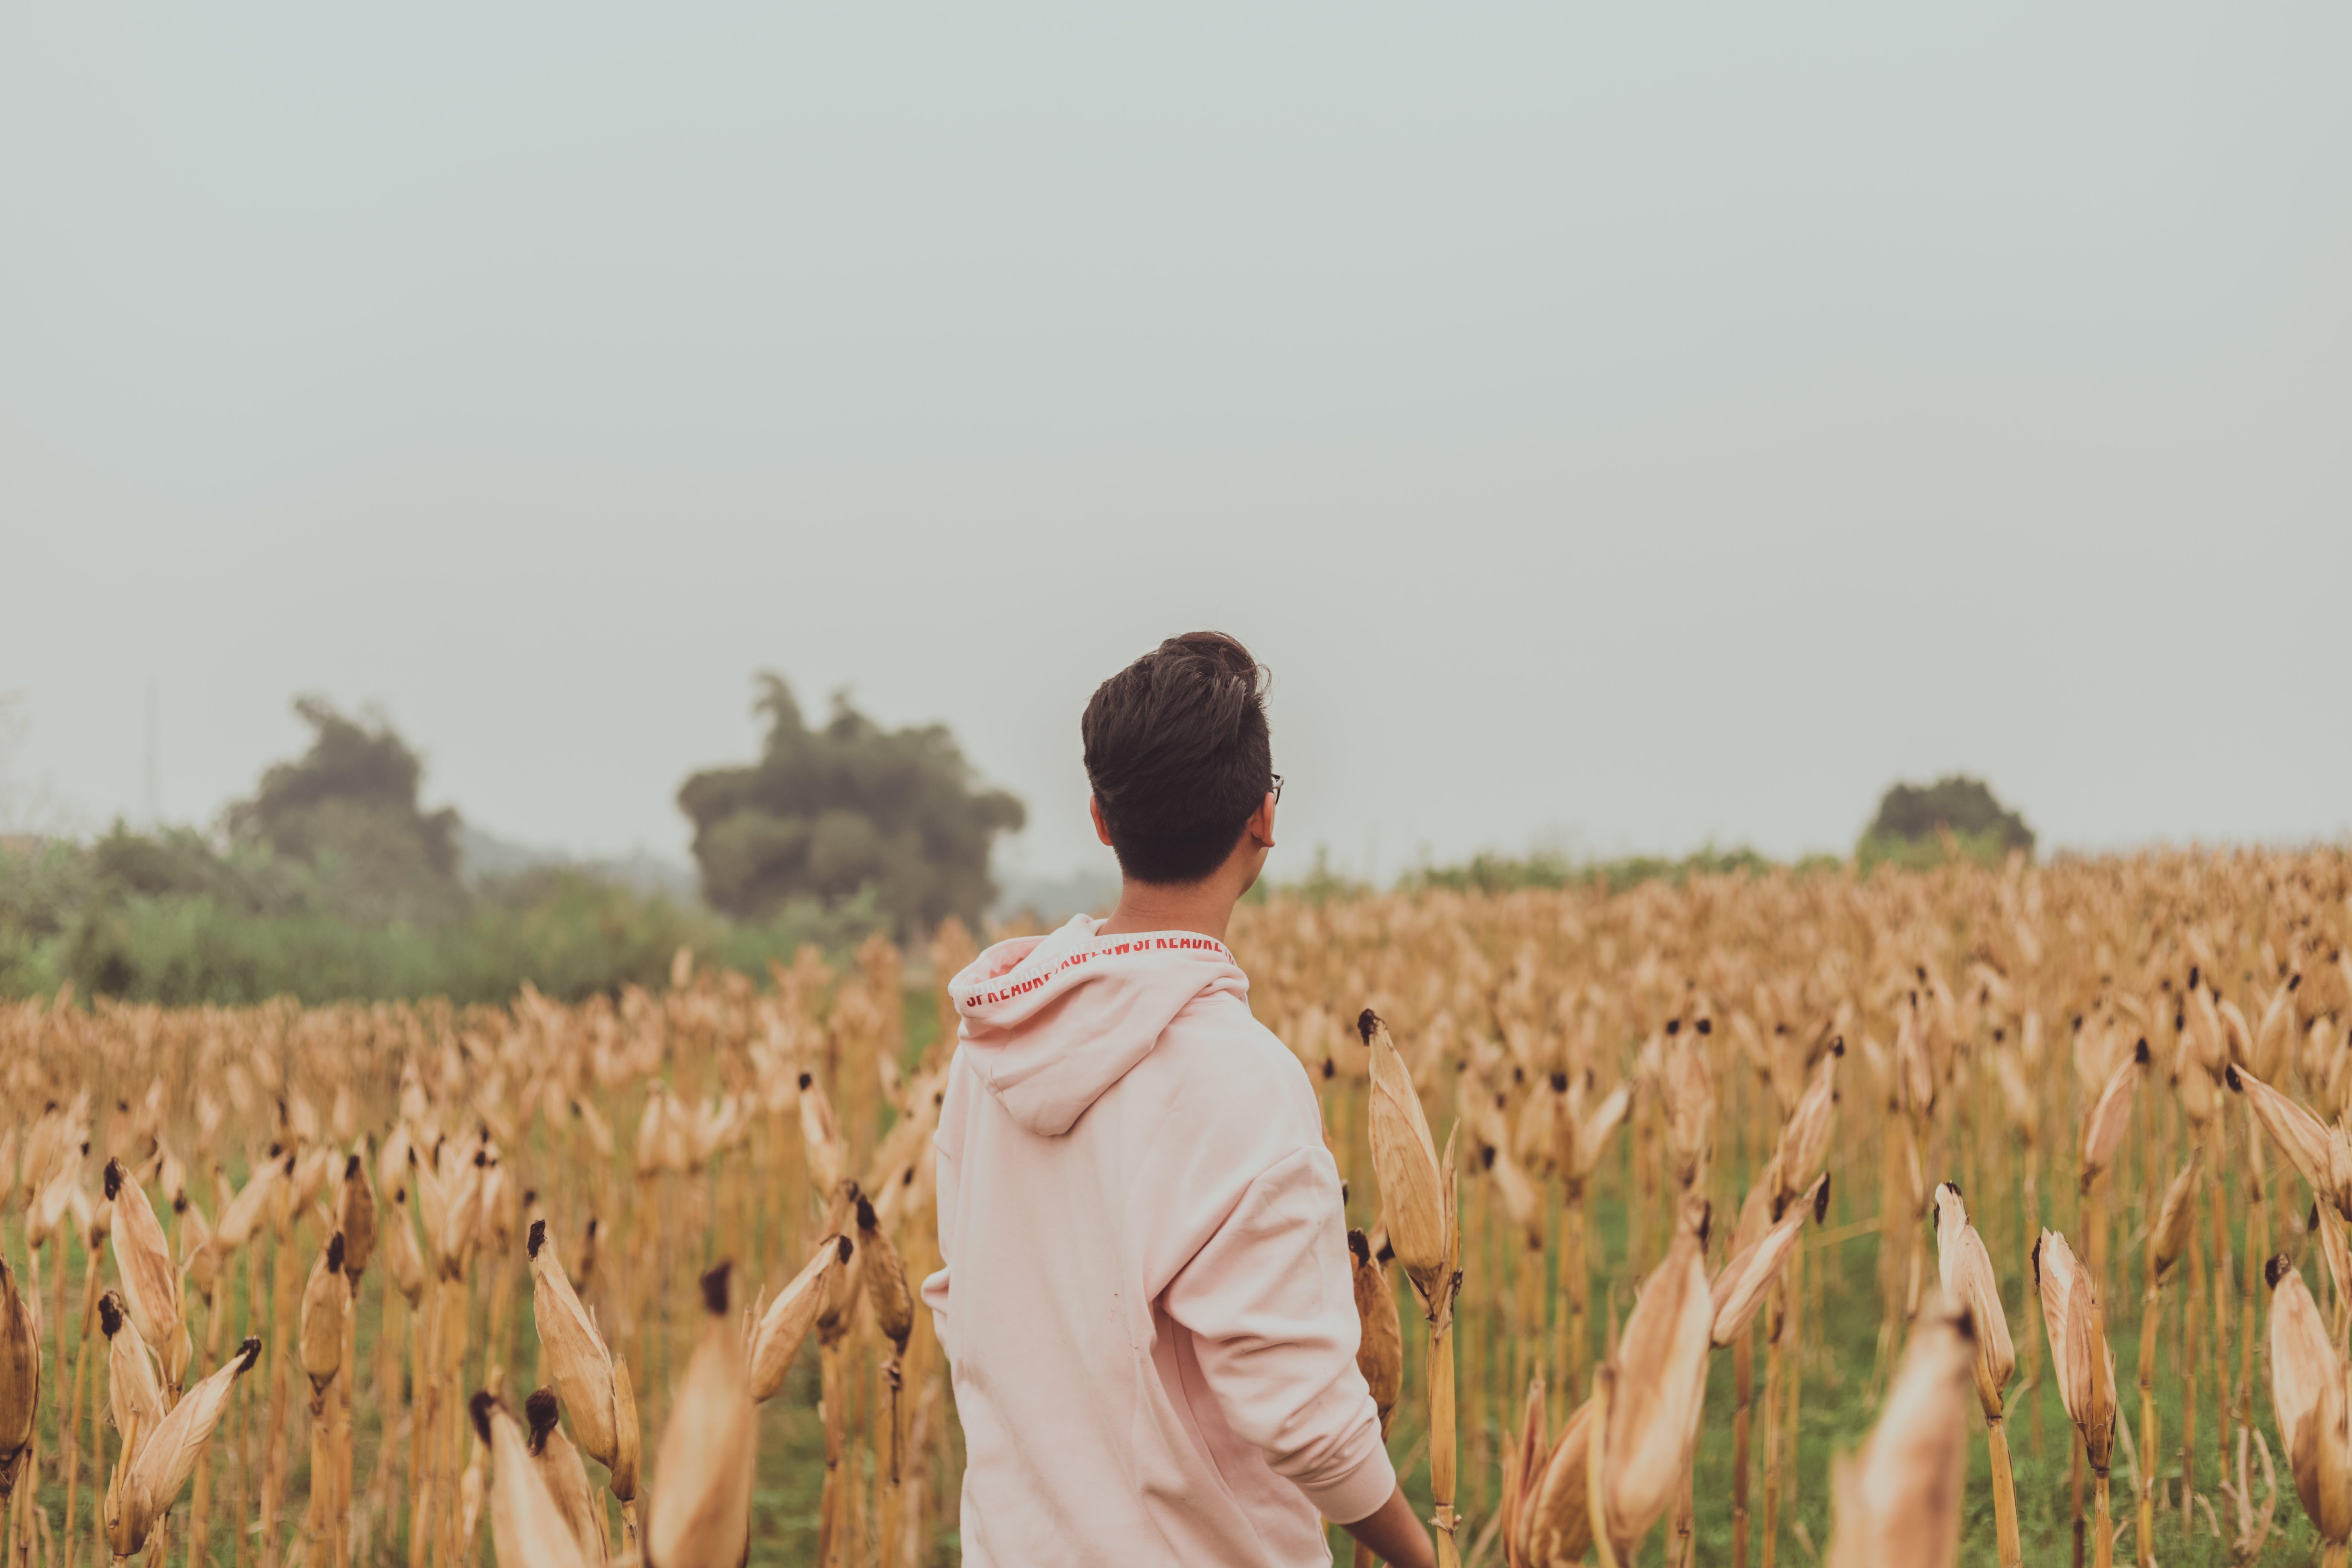 Man in White Hoodie Standing on White Grass Field